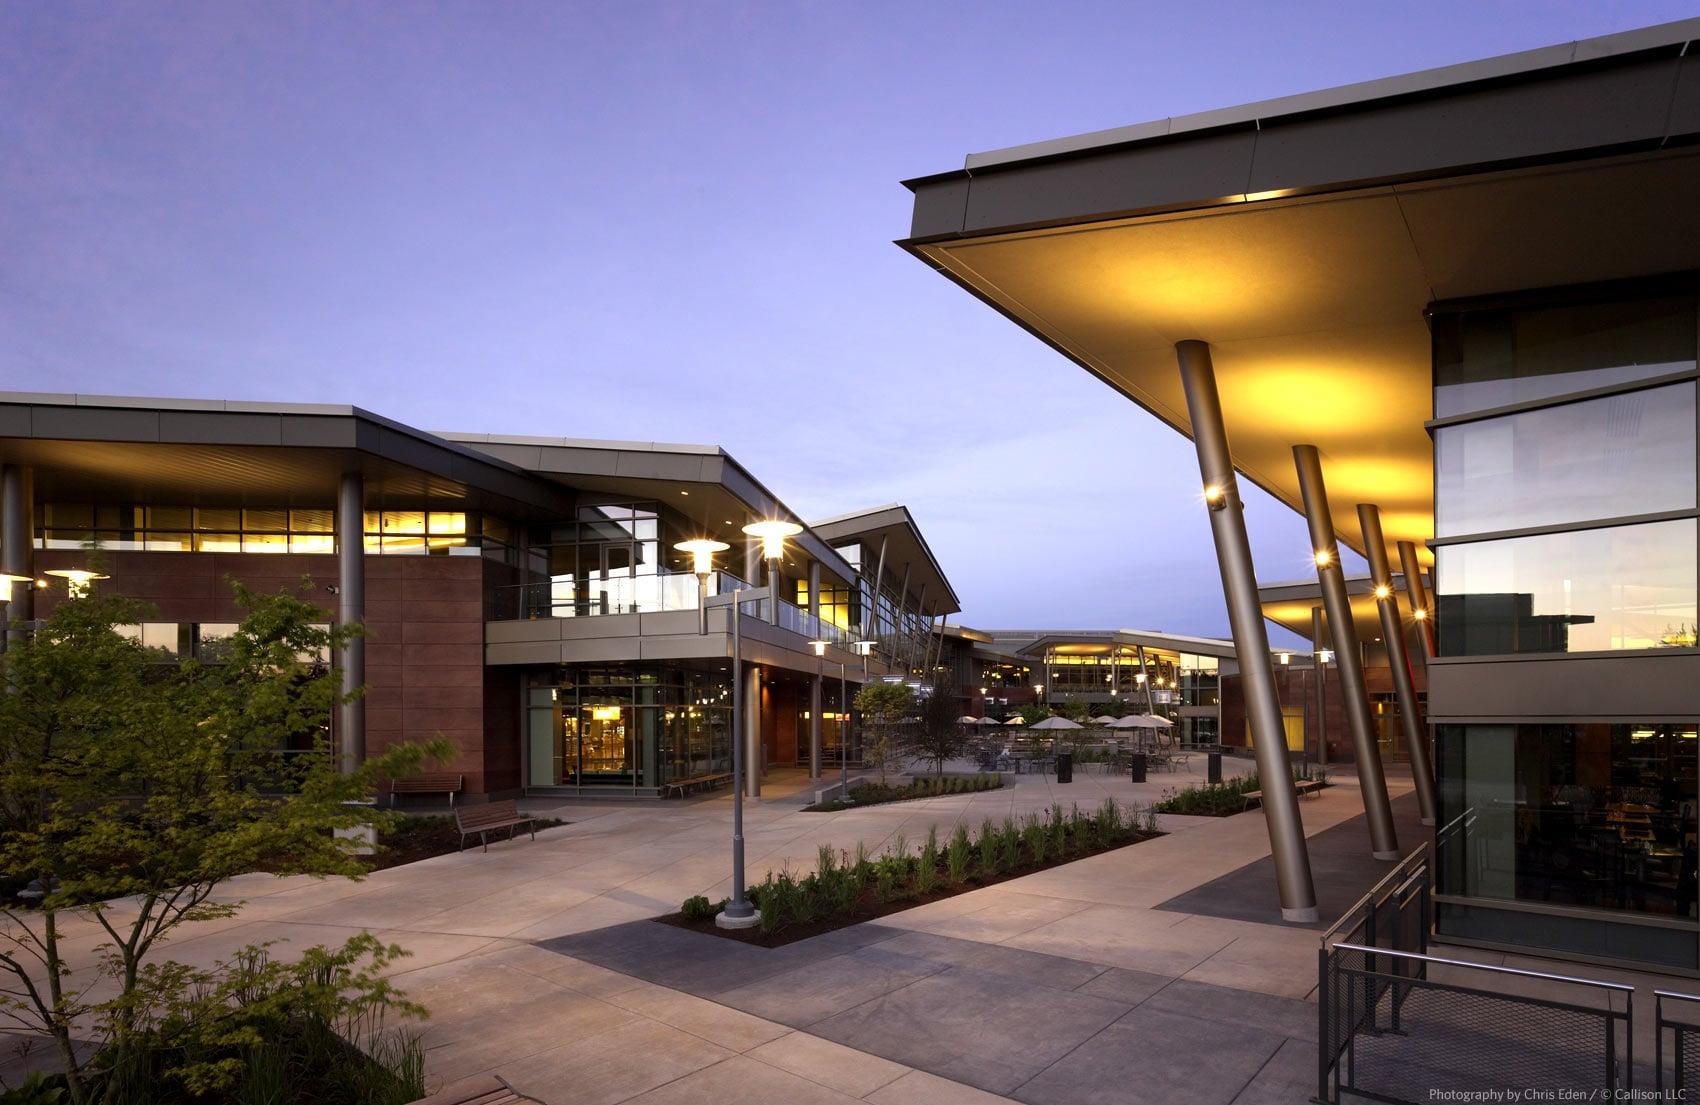 Software Company HQ - Campus twilight exterior